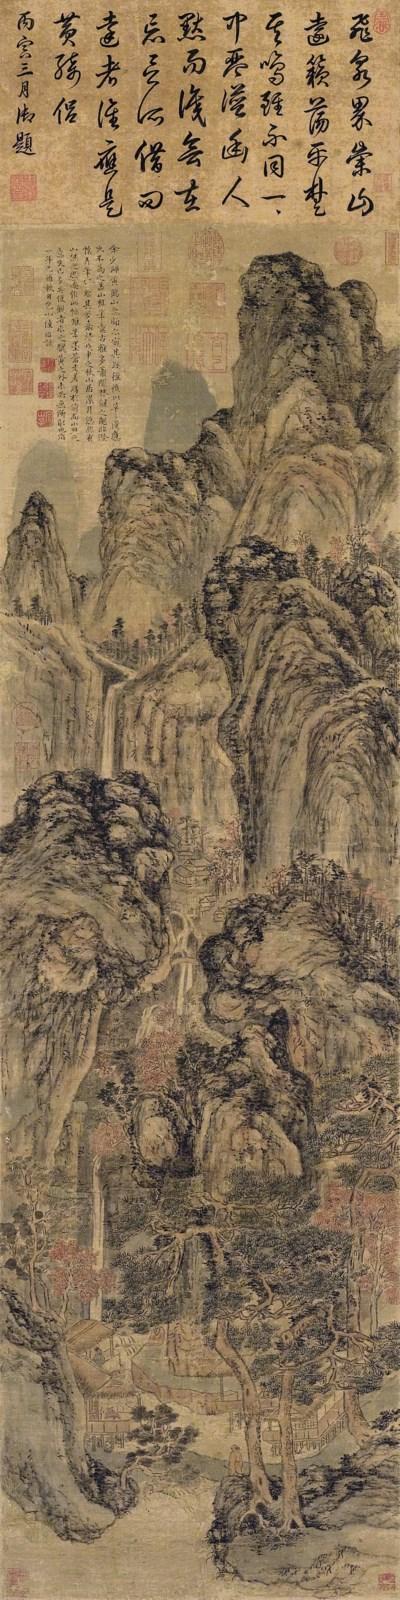 ANONYMOUS(16TH CENTURY)